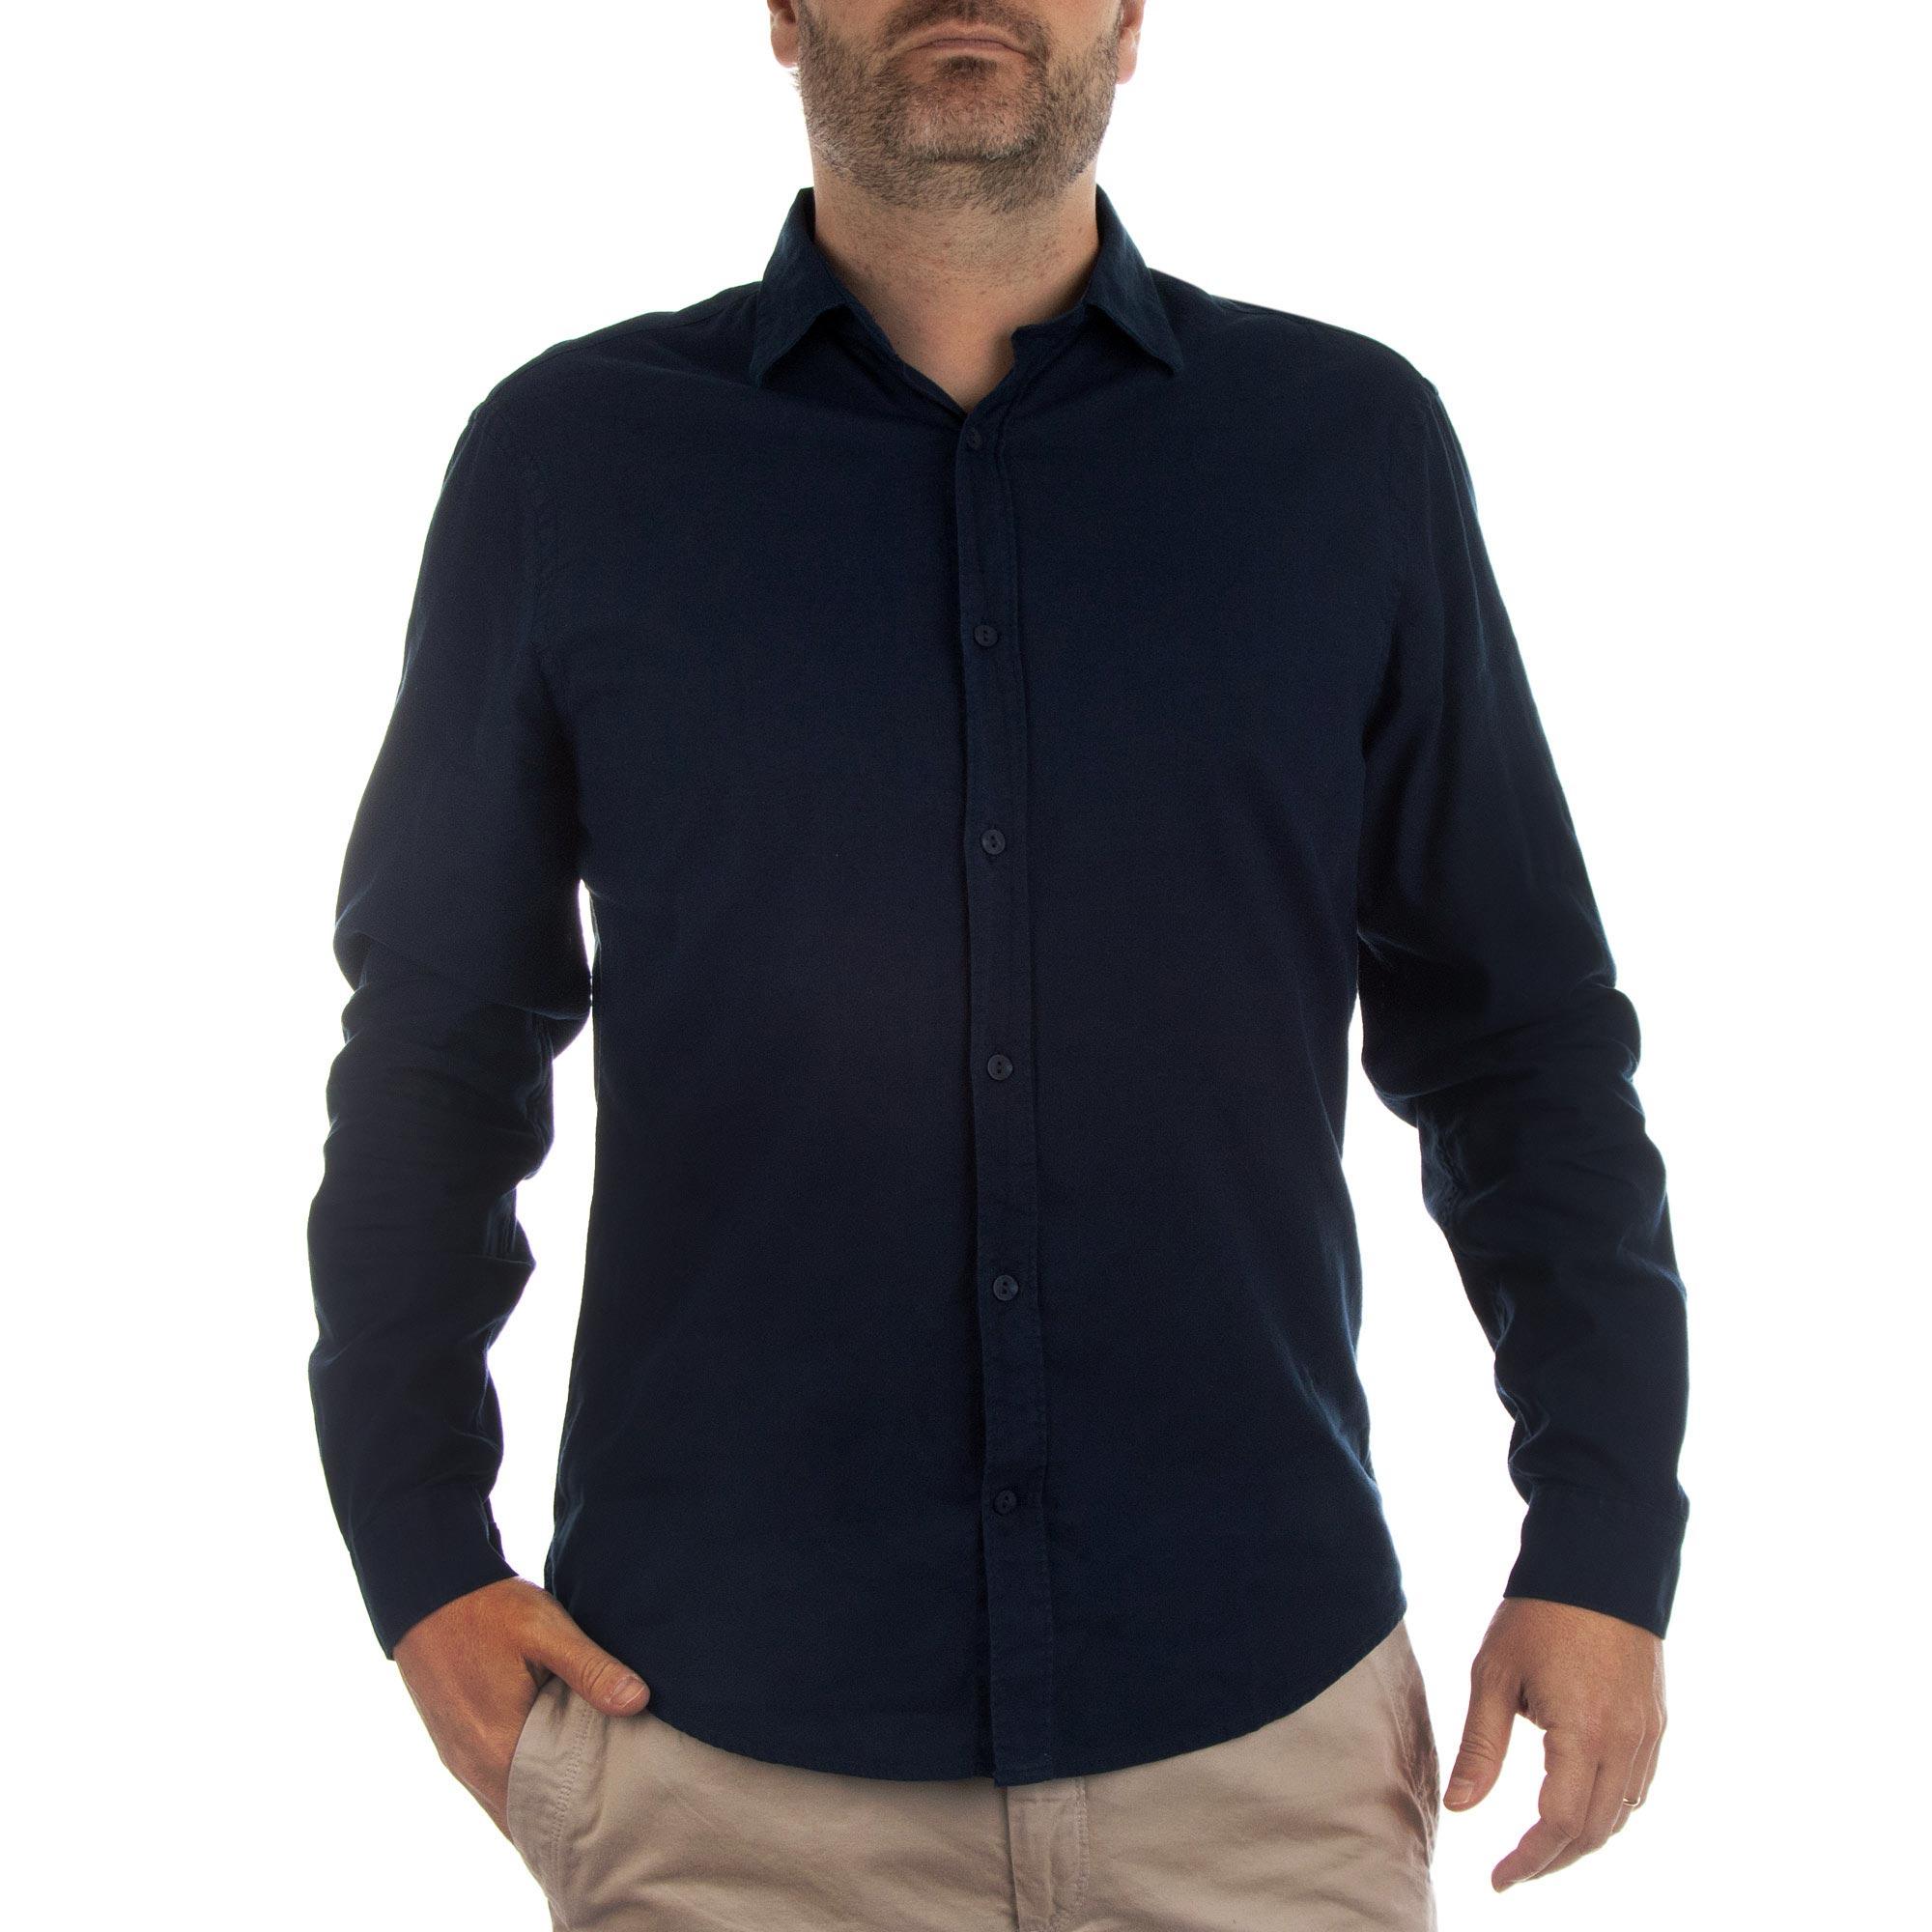 Richards Camisa Tinturada Linho Blend Manga Longa Masculino Marinho